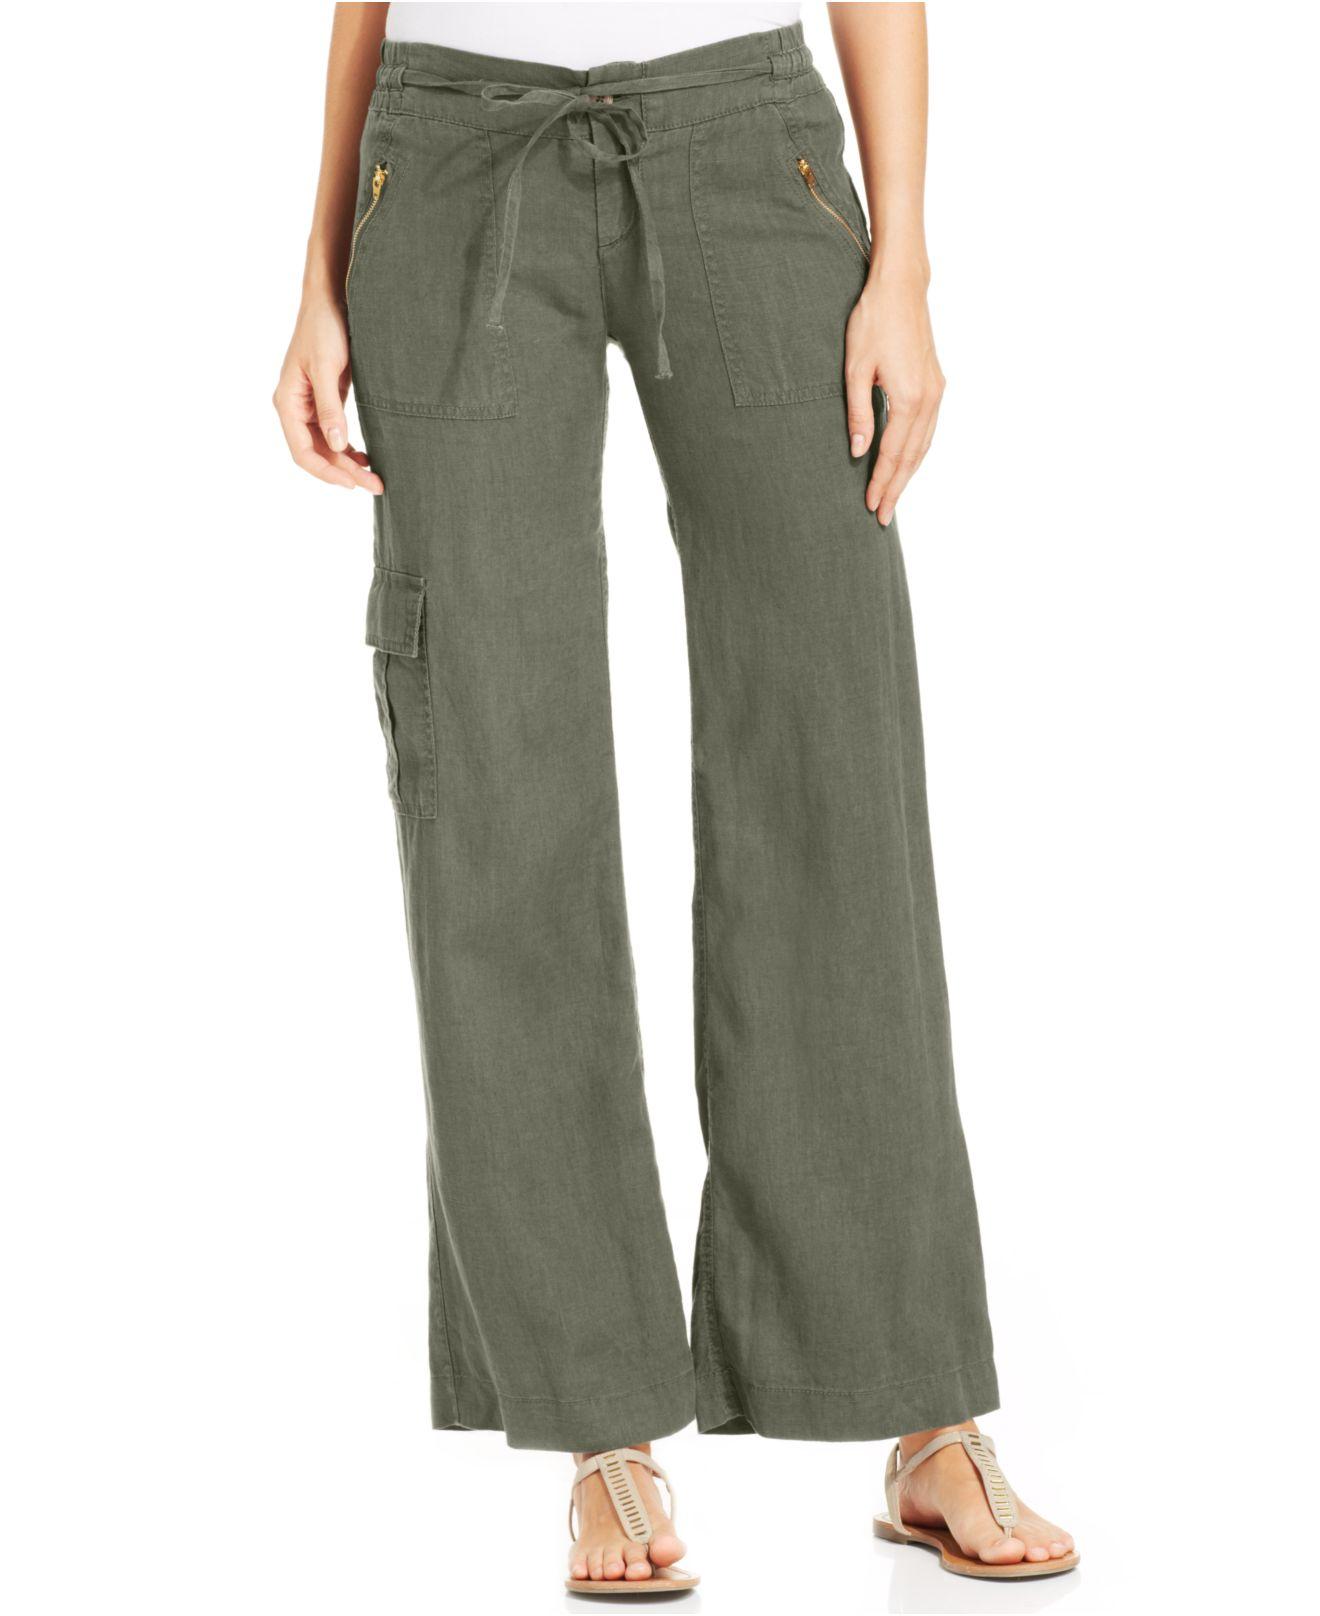 Kut from the kloth Wide-Leg Linen Pants in Green | Lyst